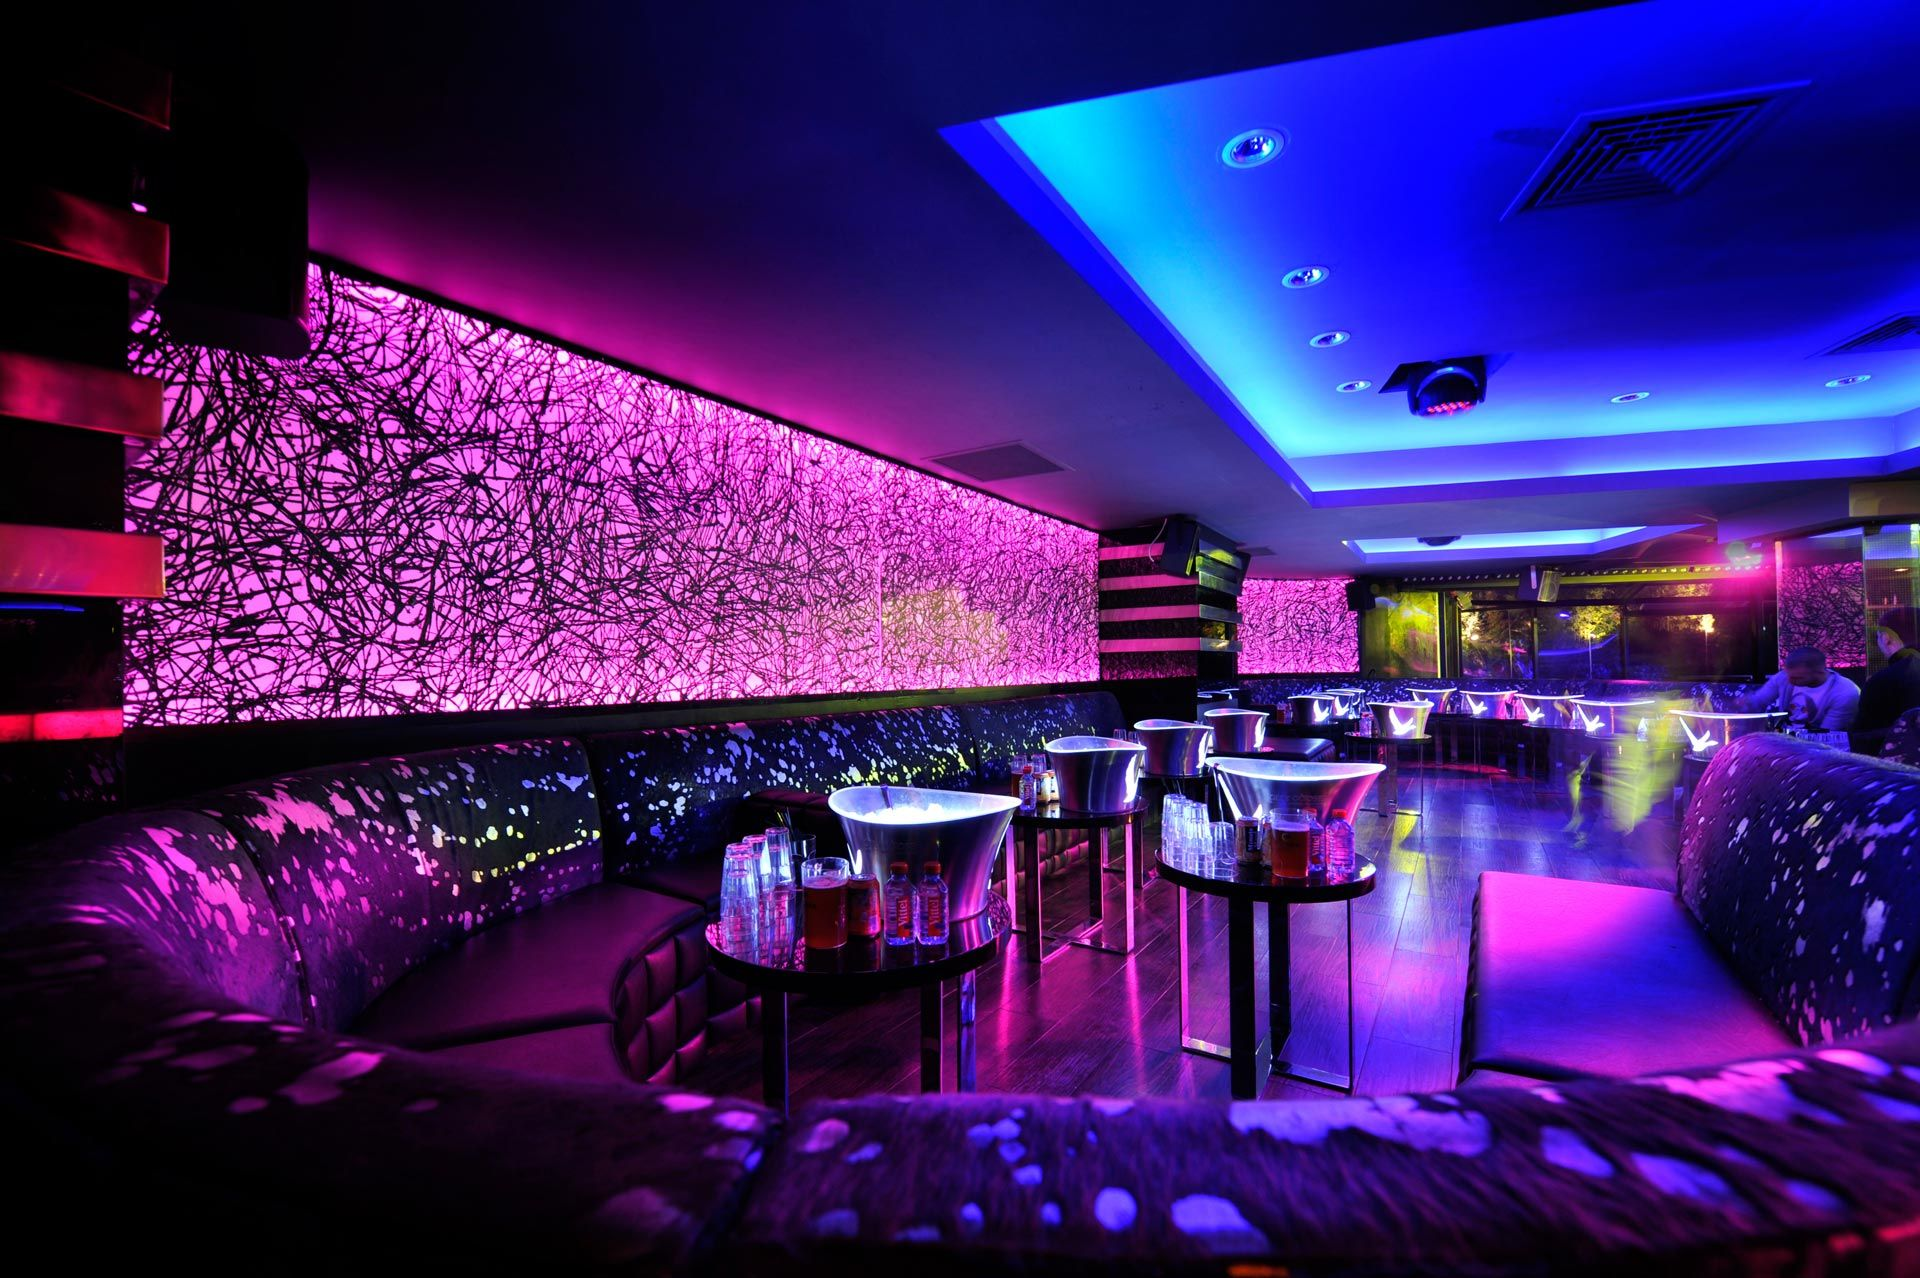 Wonderful Neon Lights In A Night Club Lounge HD Desktop Background Wallpaper Free